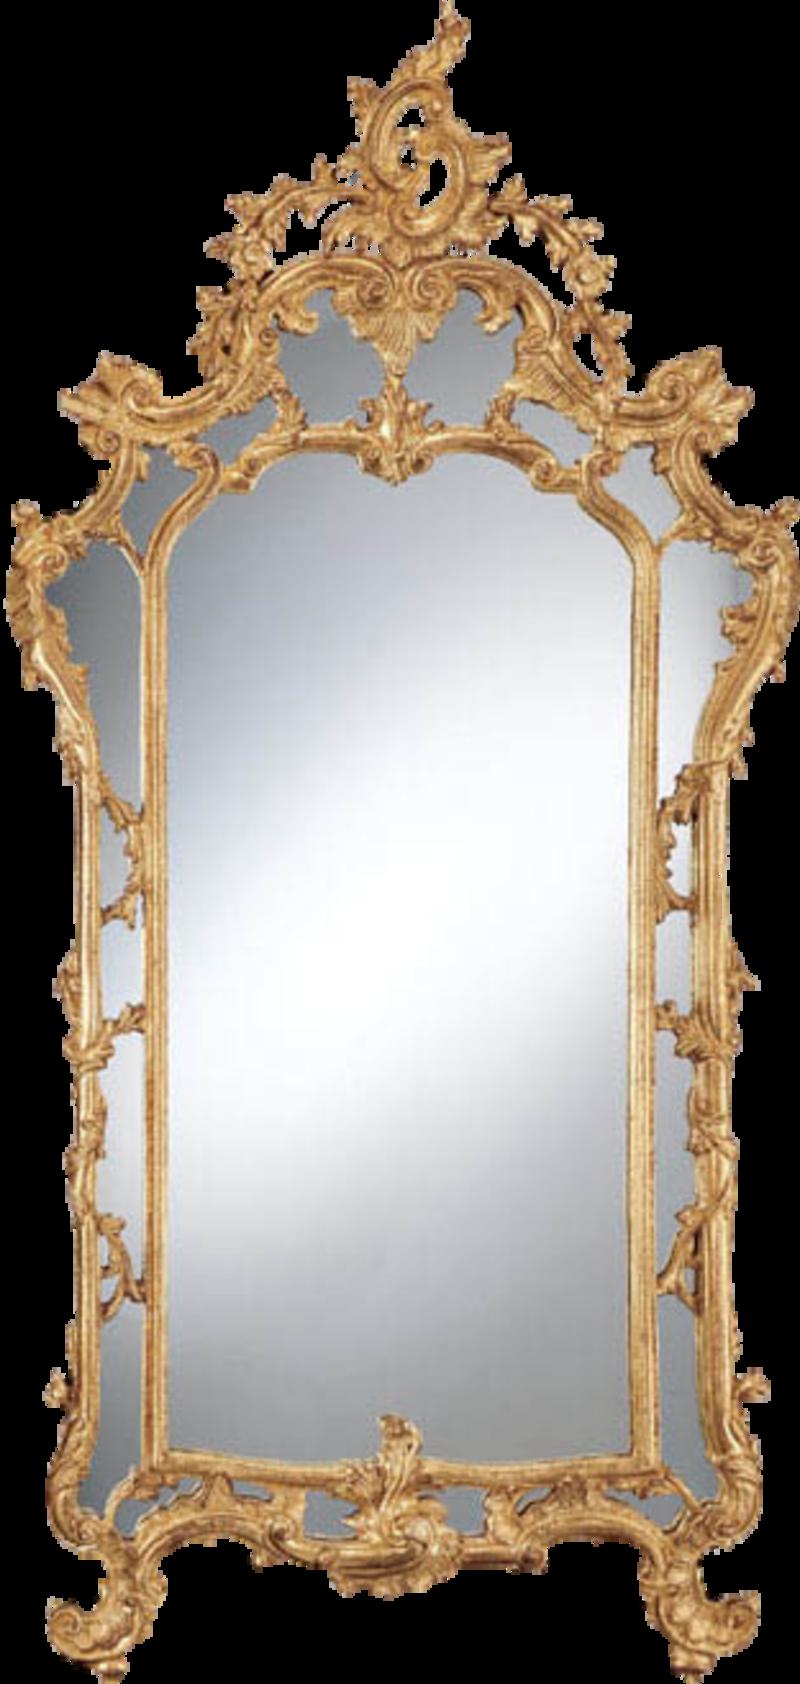 Gif miroirmon beau miroir page 2 for Beaux miroirs